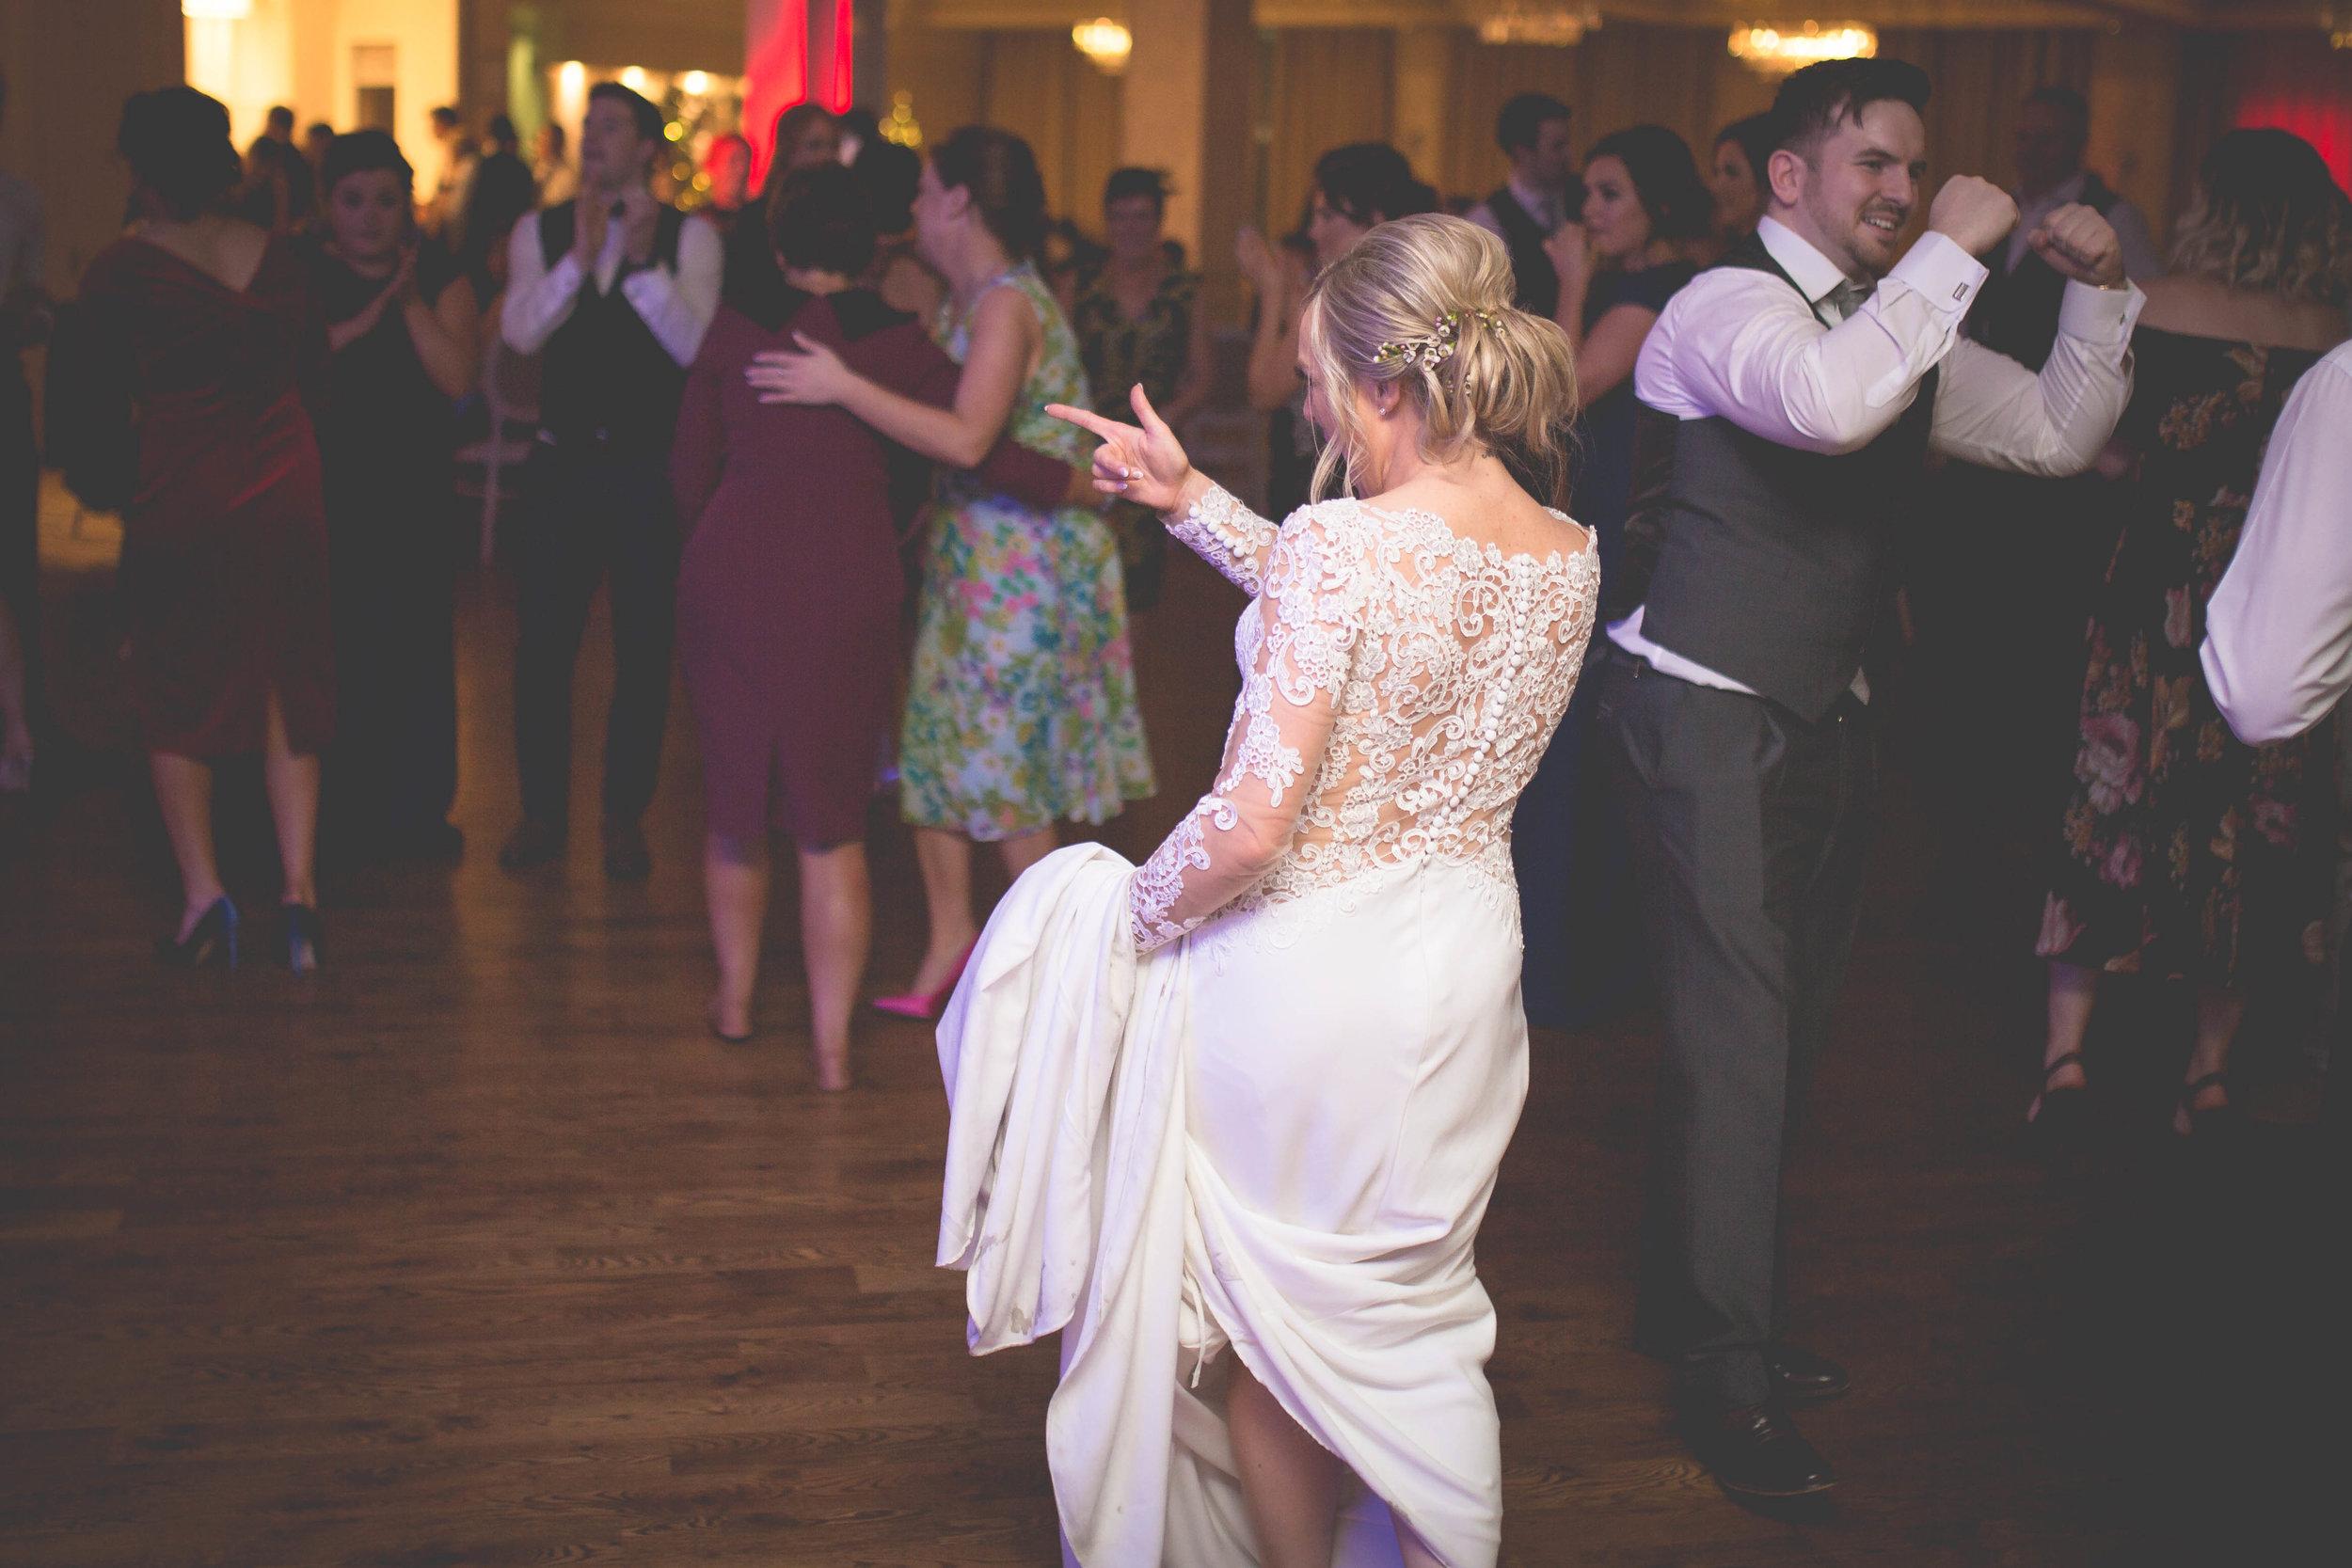 MaryJo_Conor_Mageean_Dancing-14.jpg